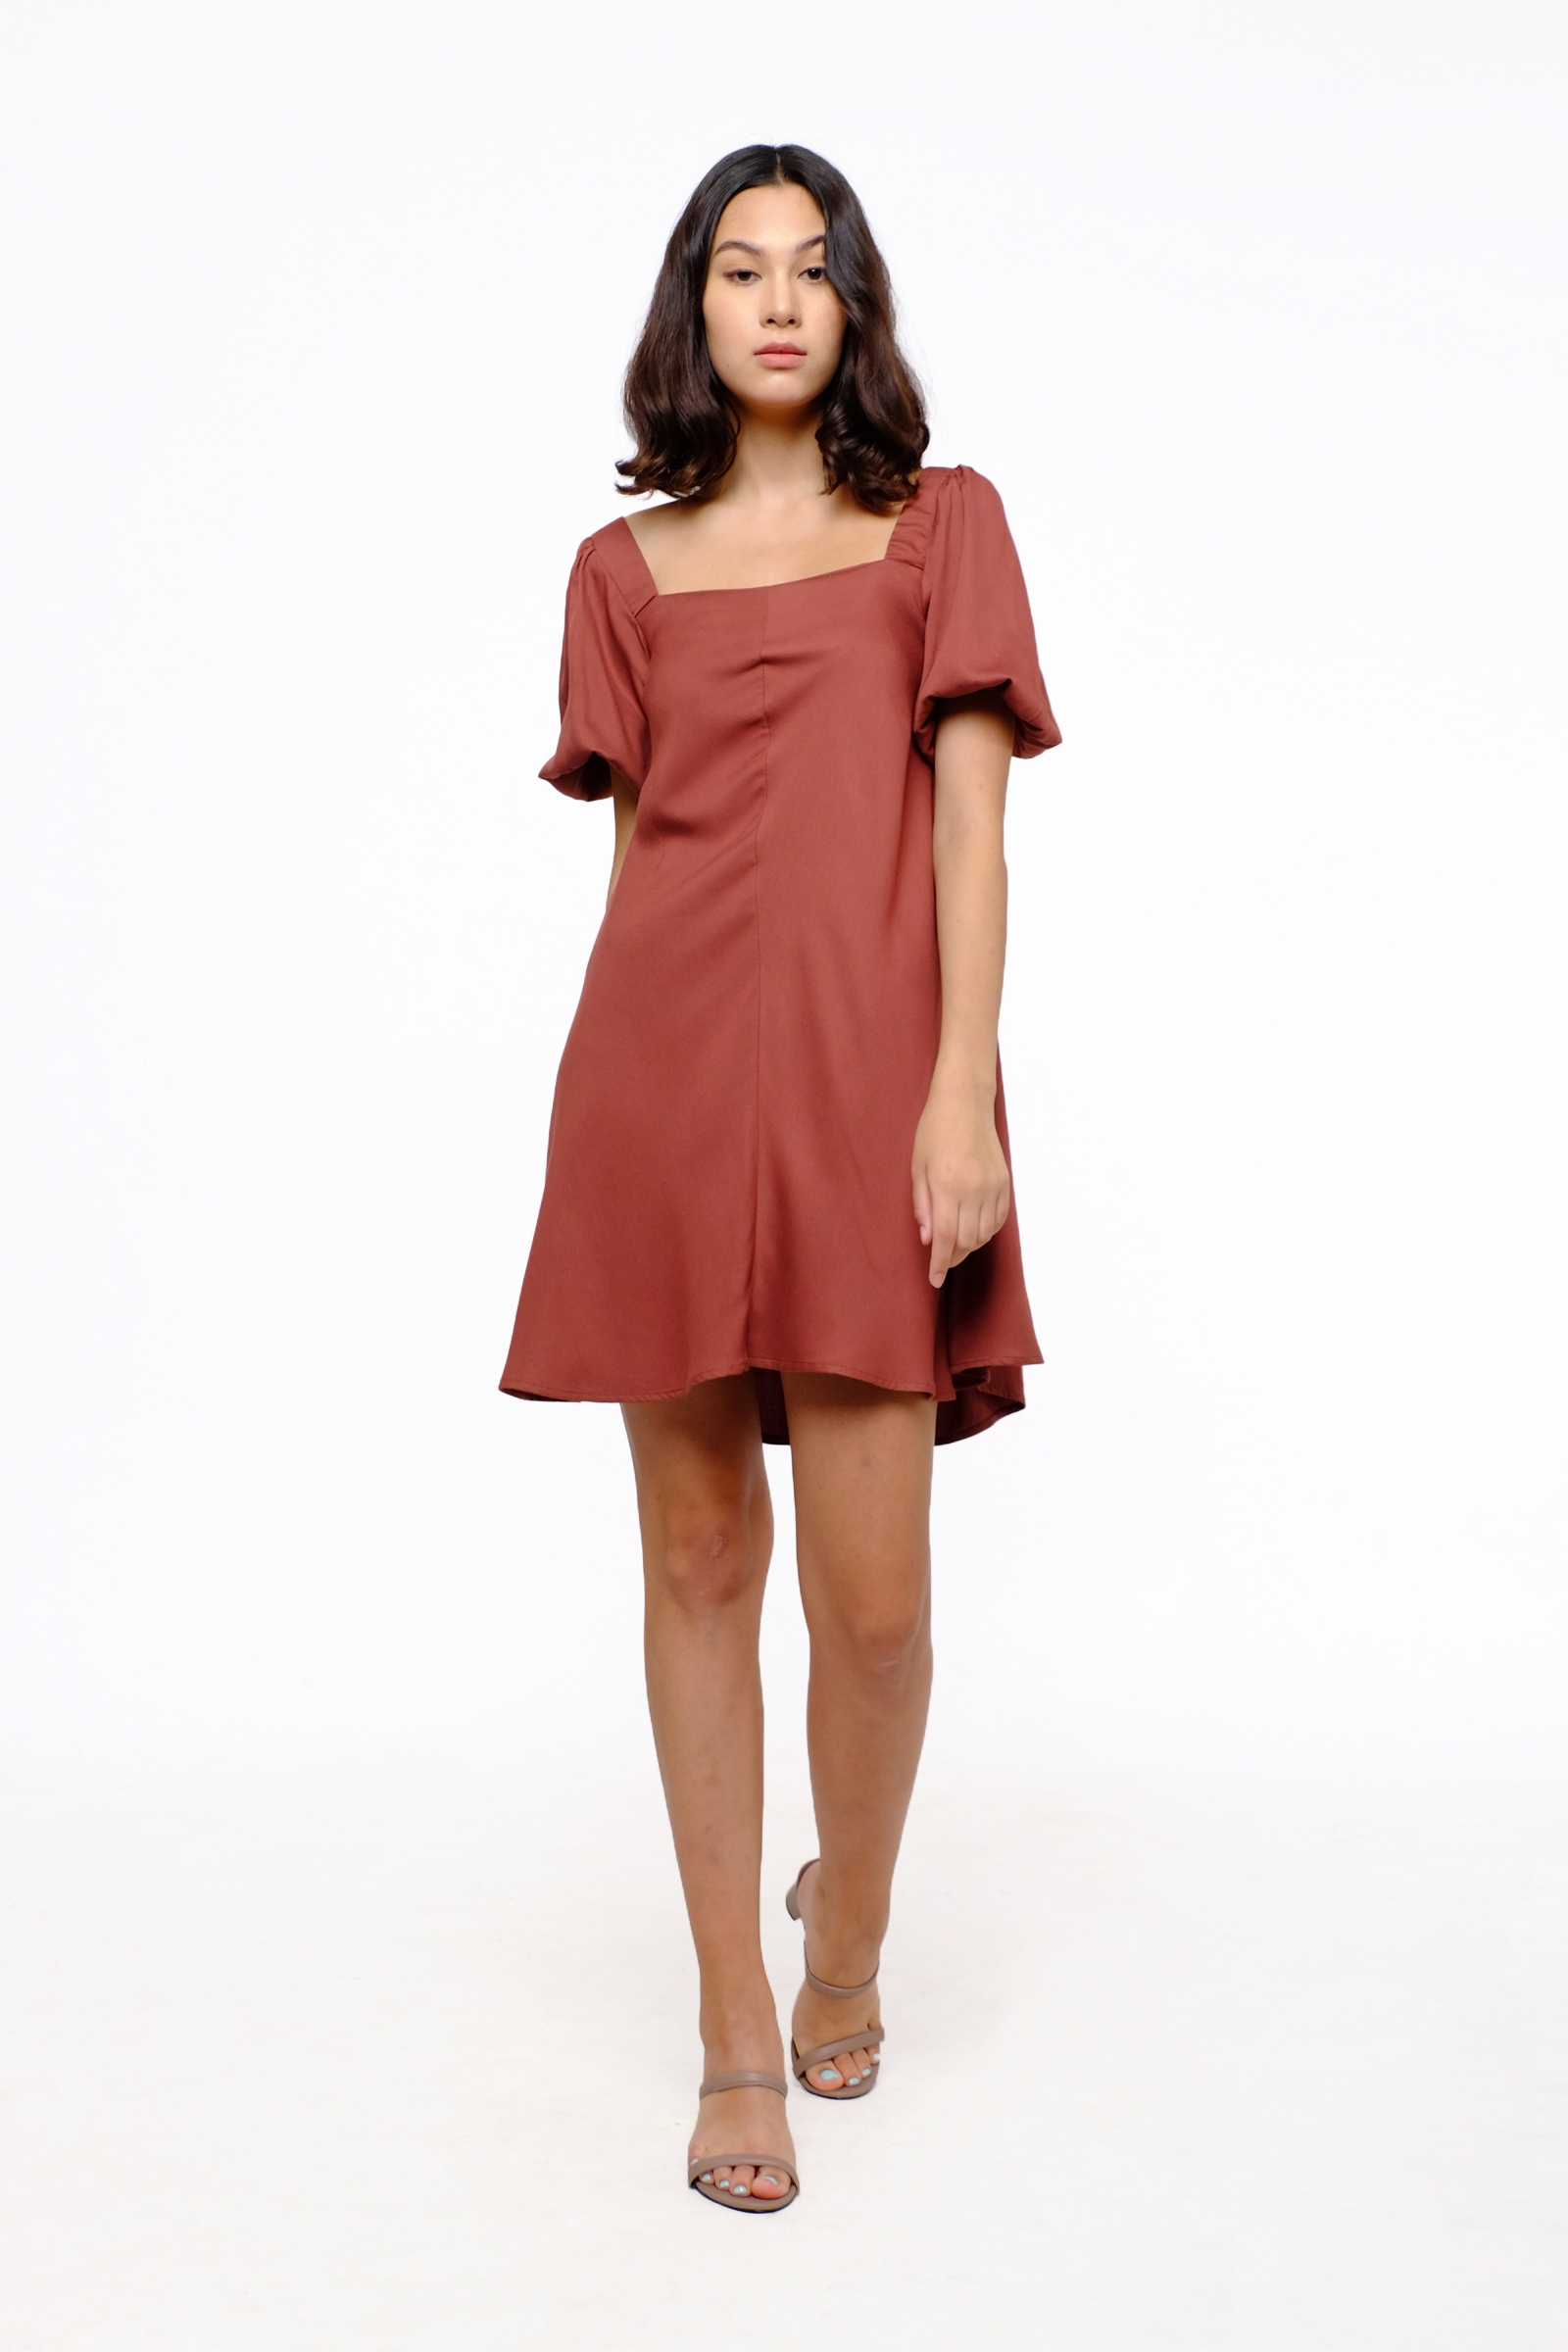 Picture of Clarita Dress Brandy Brown